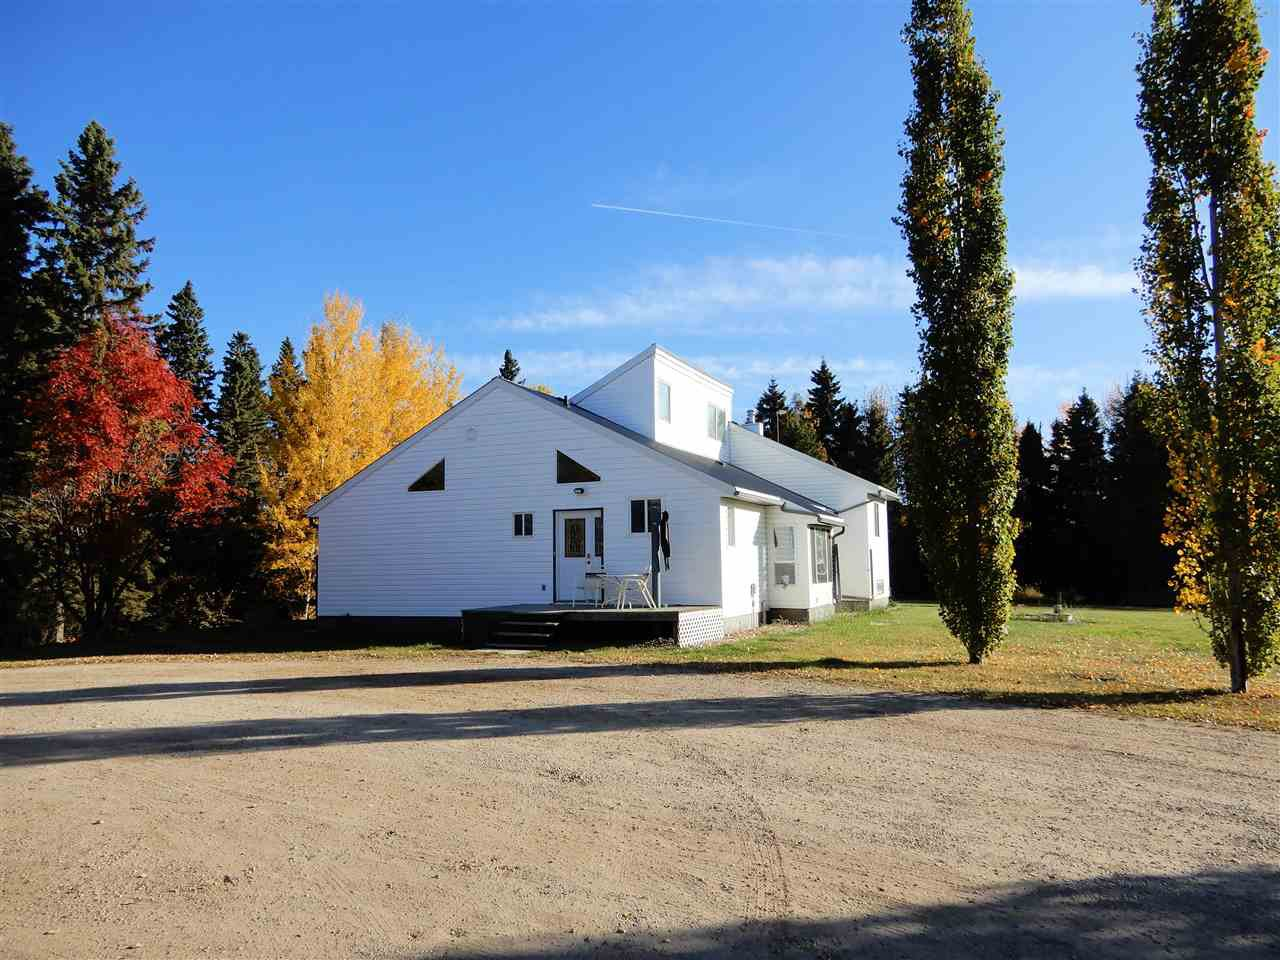 Main Photo: 56025 Rge Rd 43: Rural Lac Ste. Anne County House for sale : MLS®# E4219519